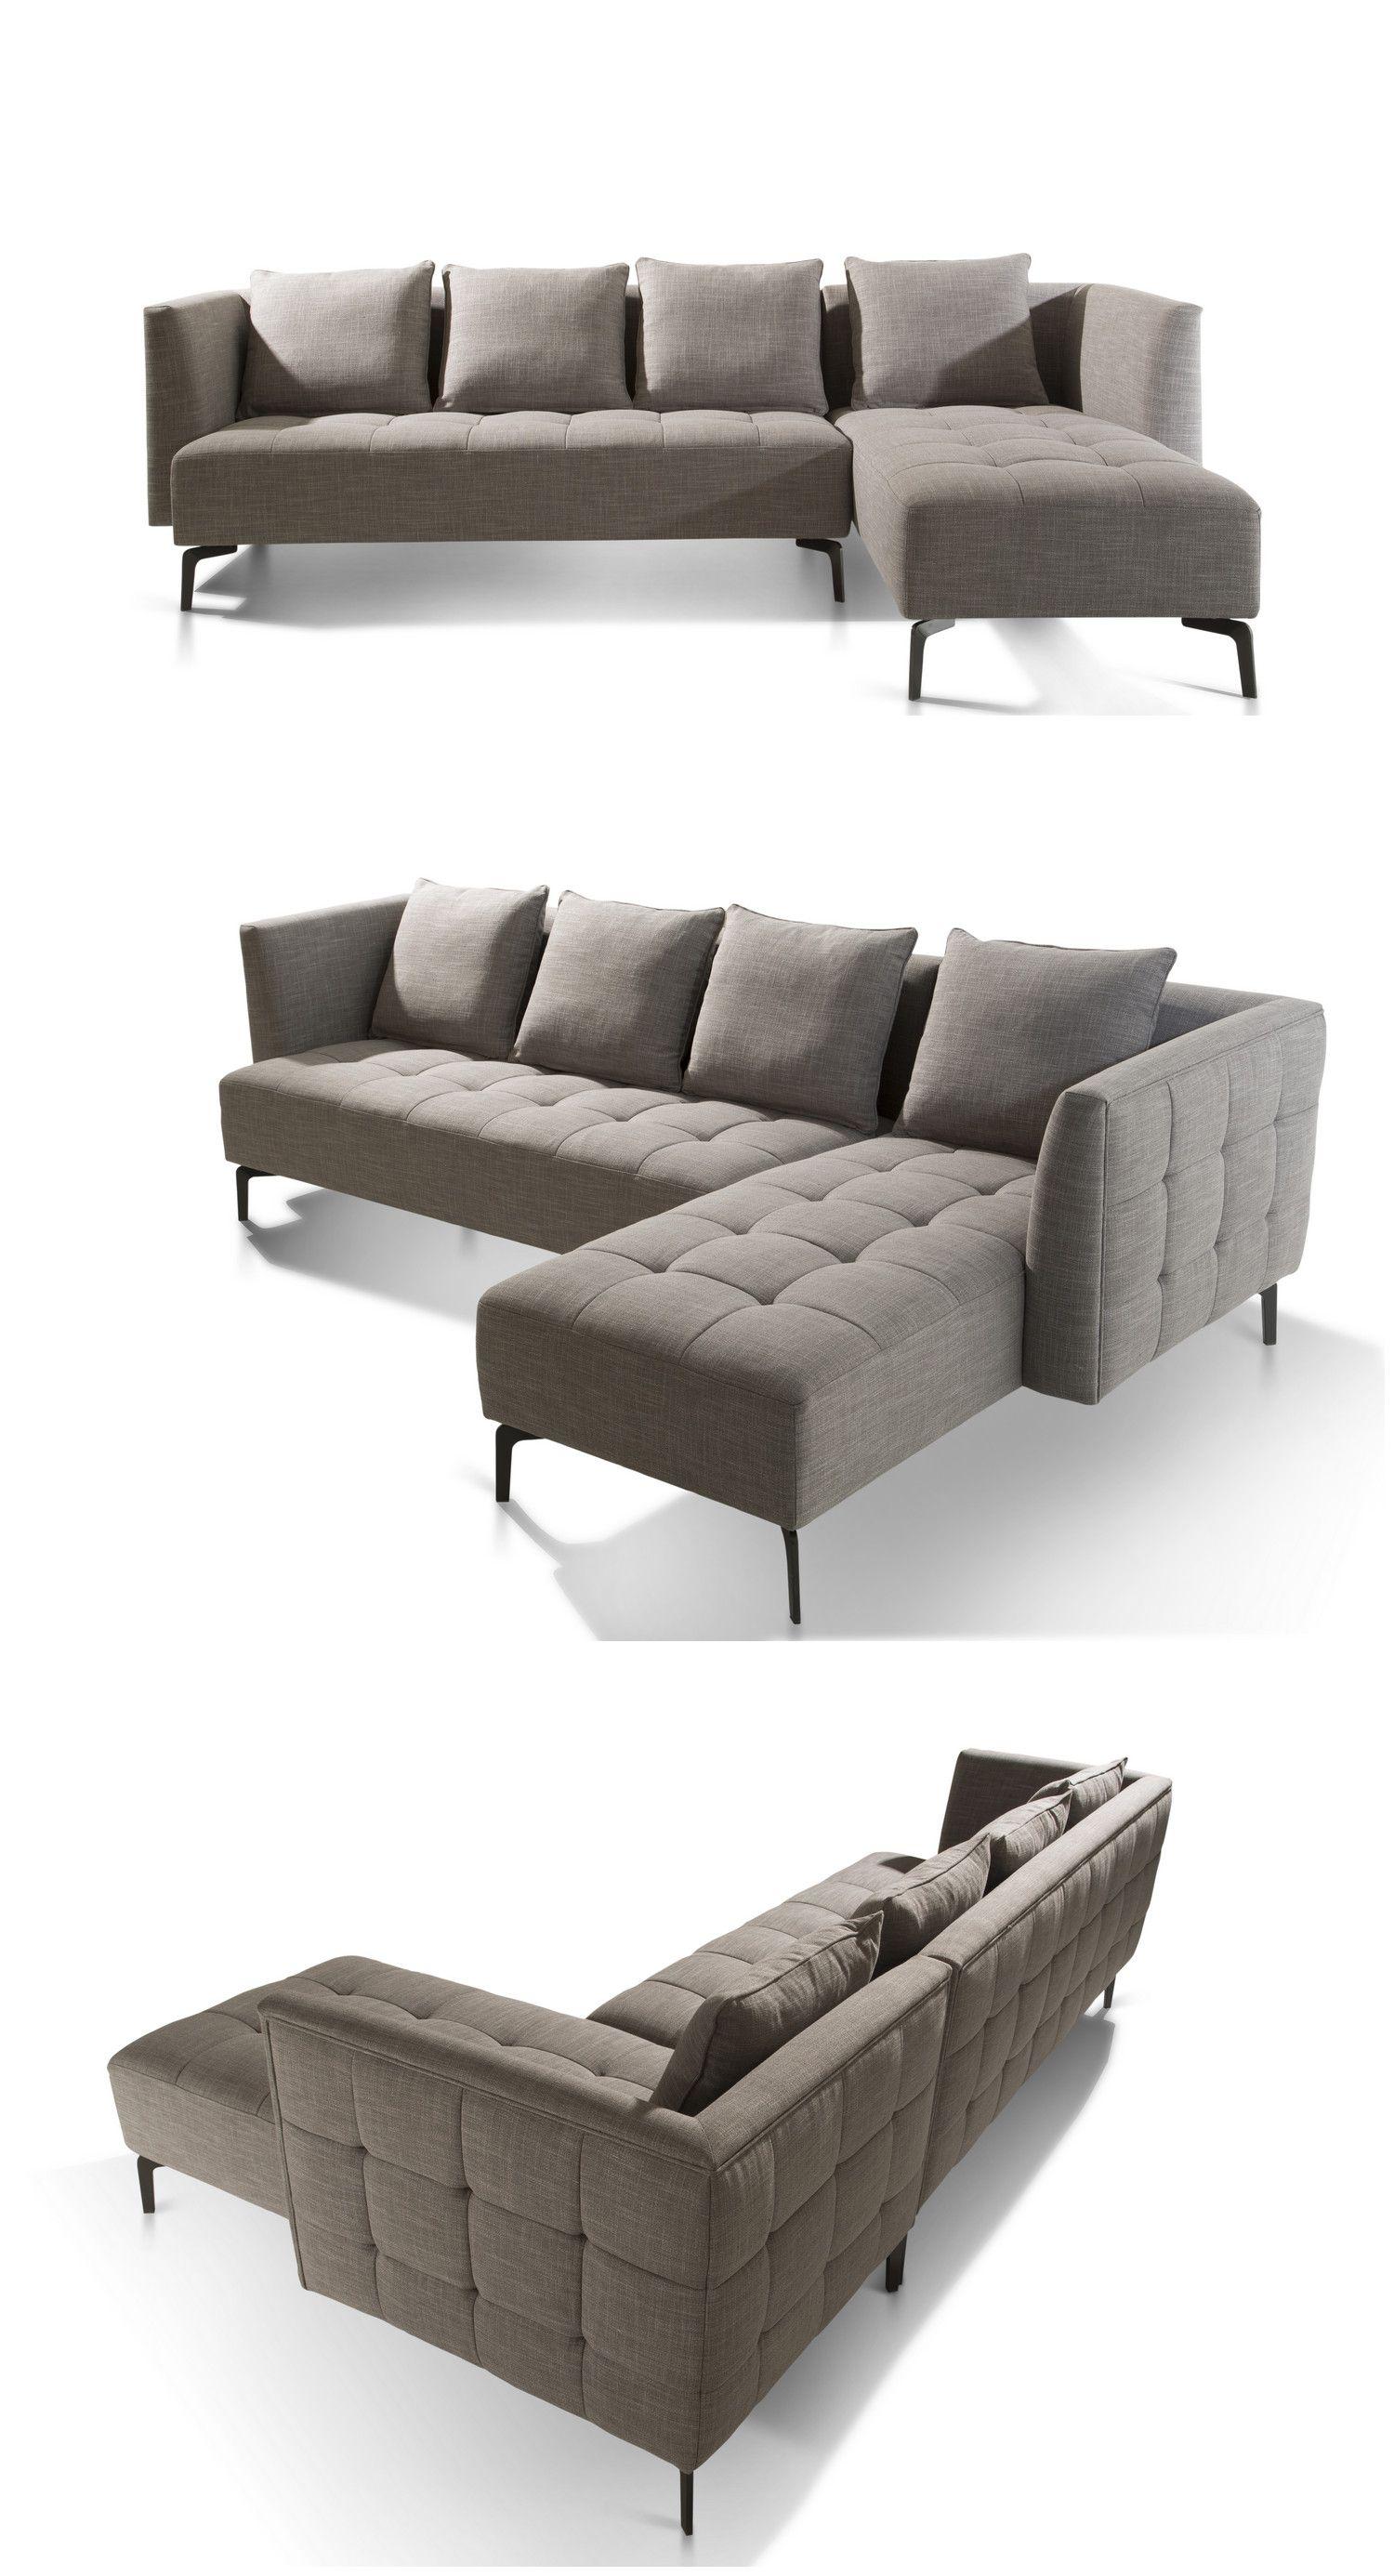 Sofa China Supplier Metal Legs Tufted Box Simple Sofa Set Living Room Sofa Design Corner Sofa Living Room Sofa Layout